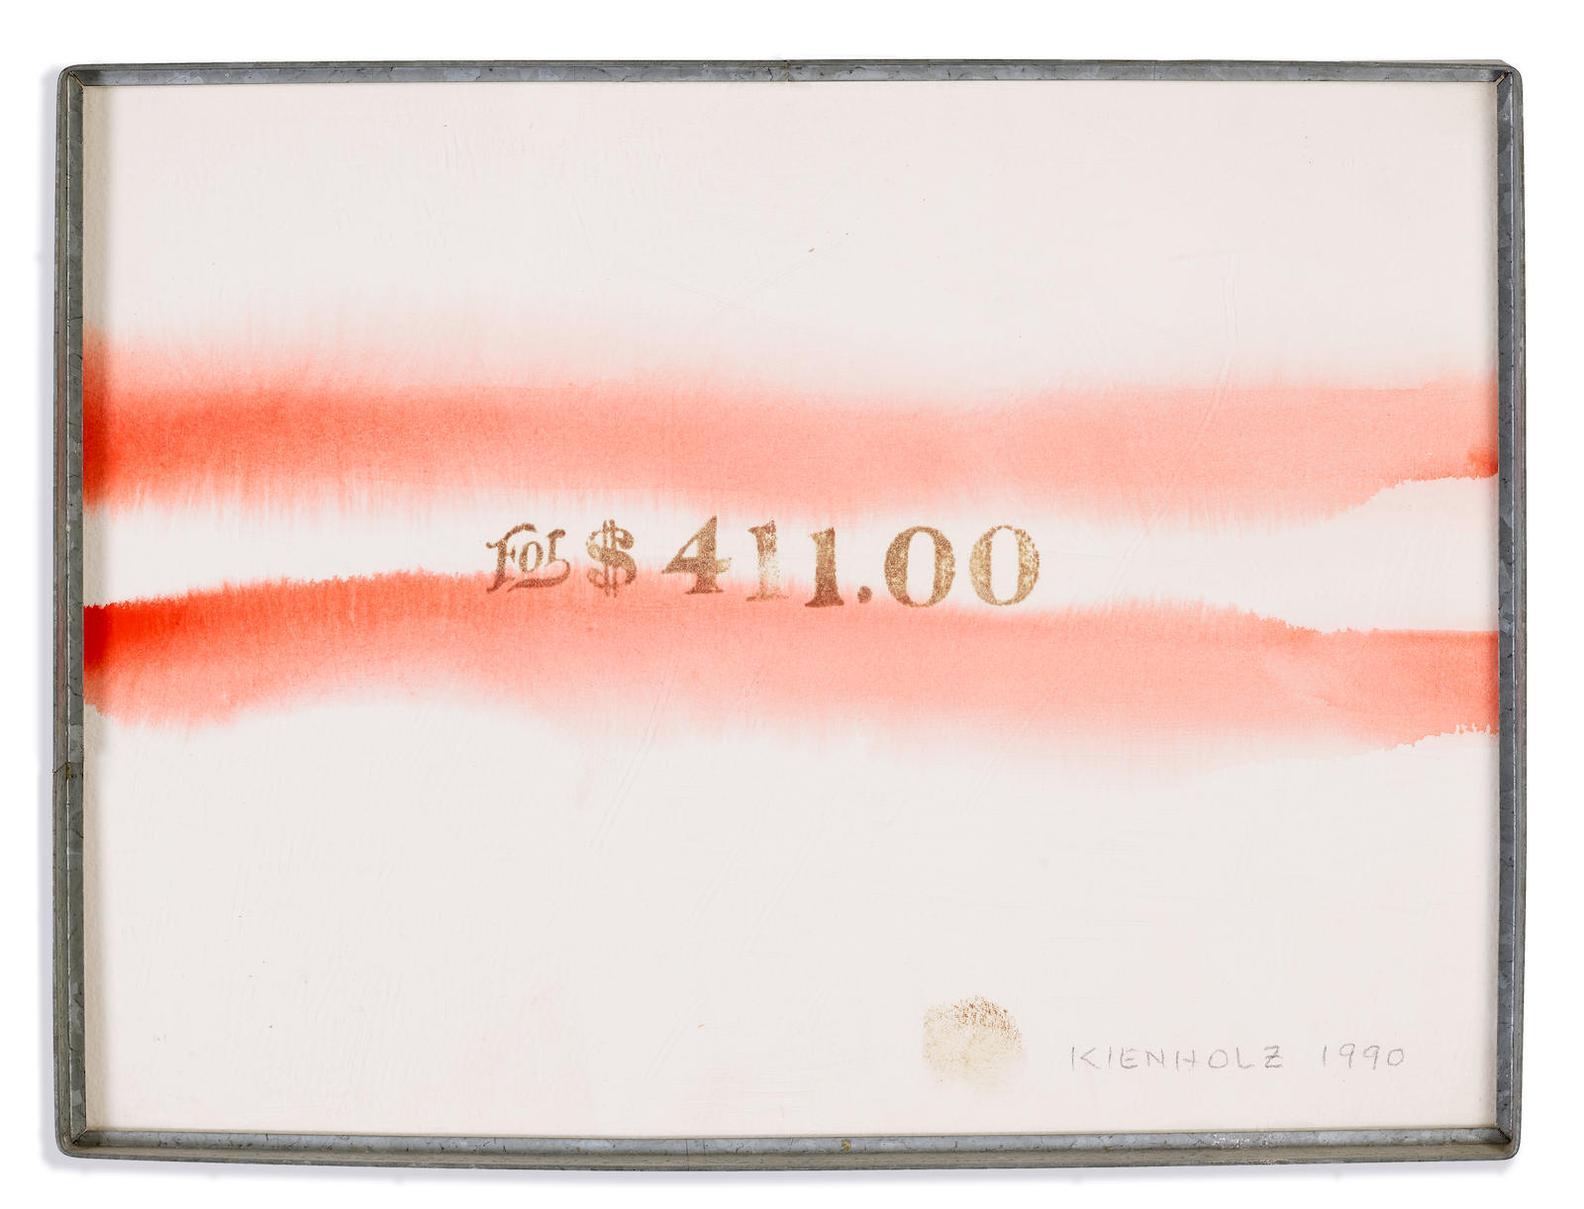 Edward Kienholz-For $411.00-1990